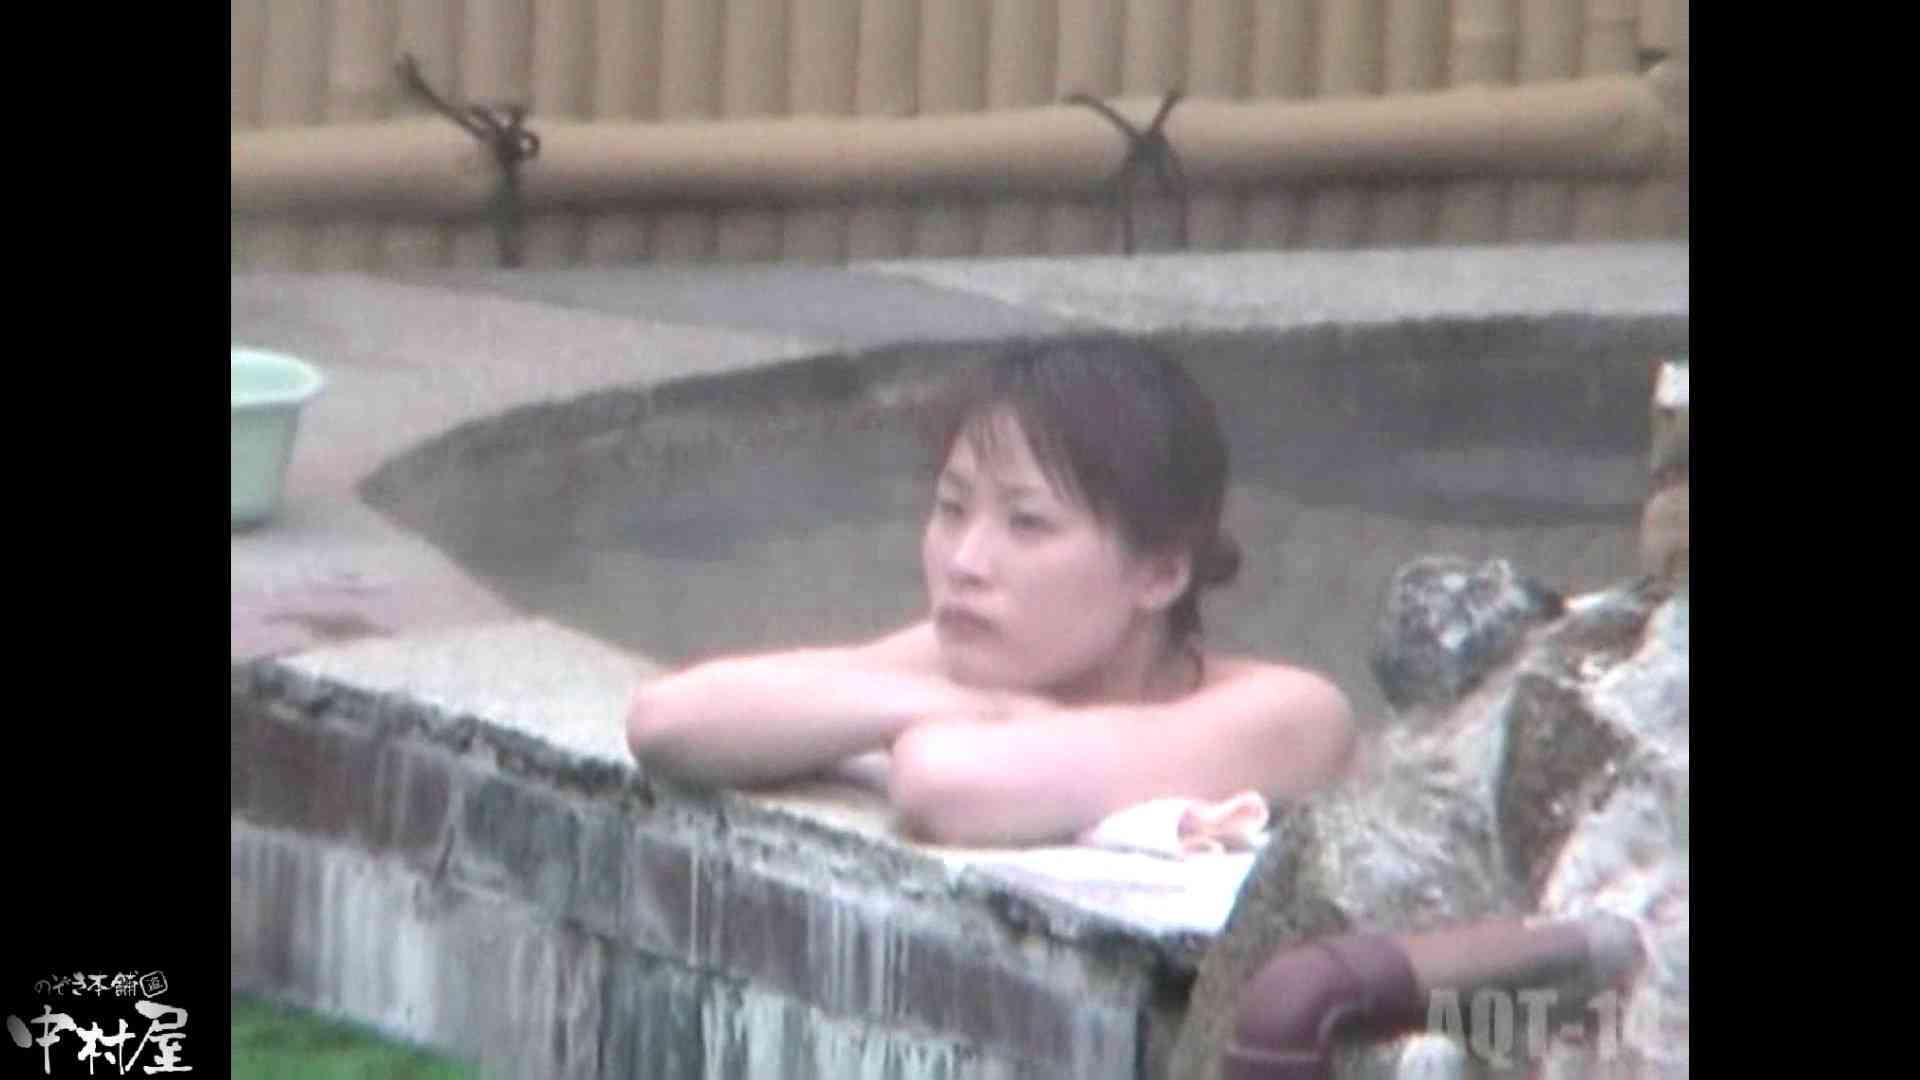 Aquaな露天風呂Vol.878潜入盗撮露天風呂十四判湯 其の三 潜入  110画像 32